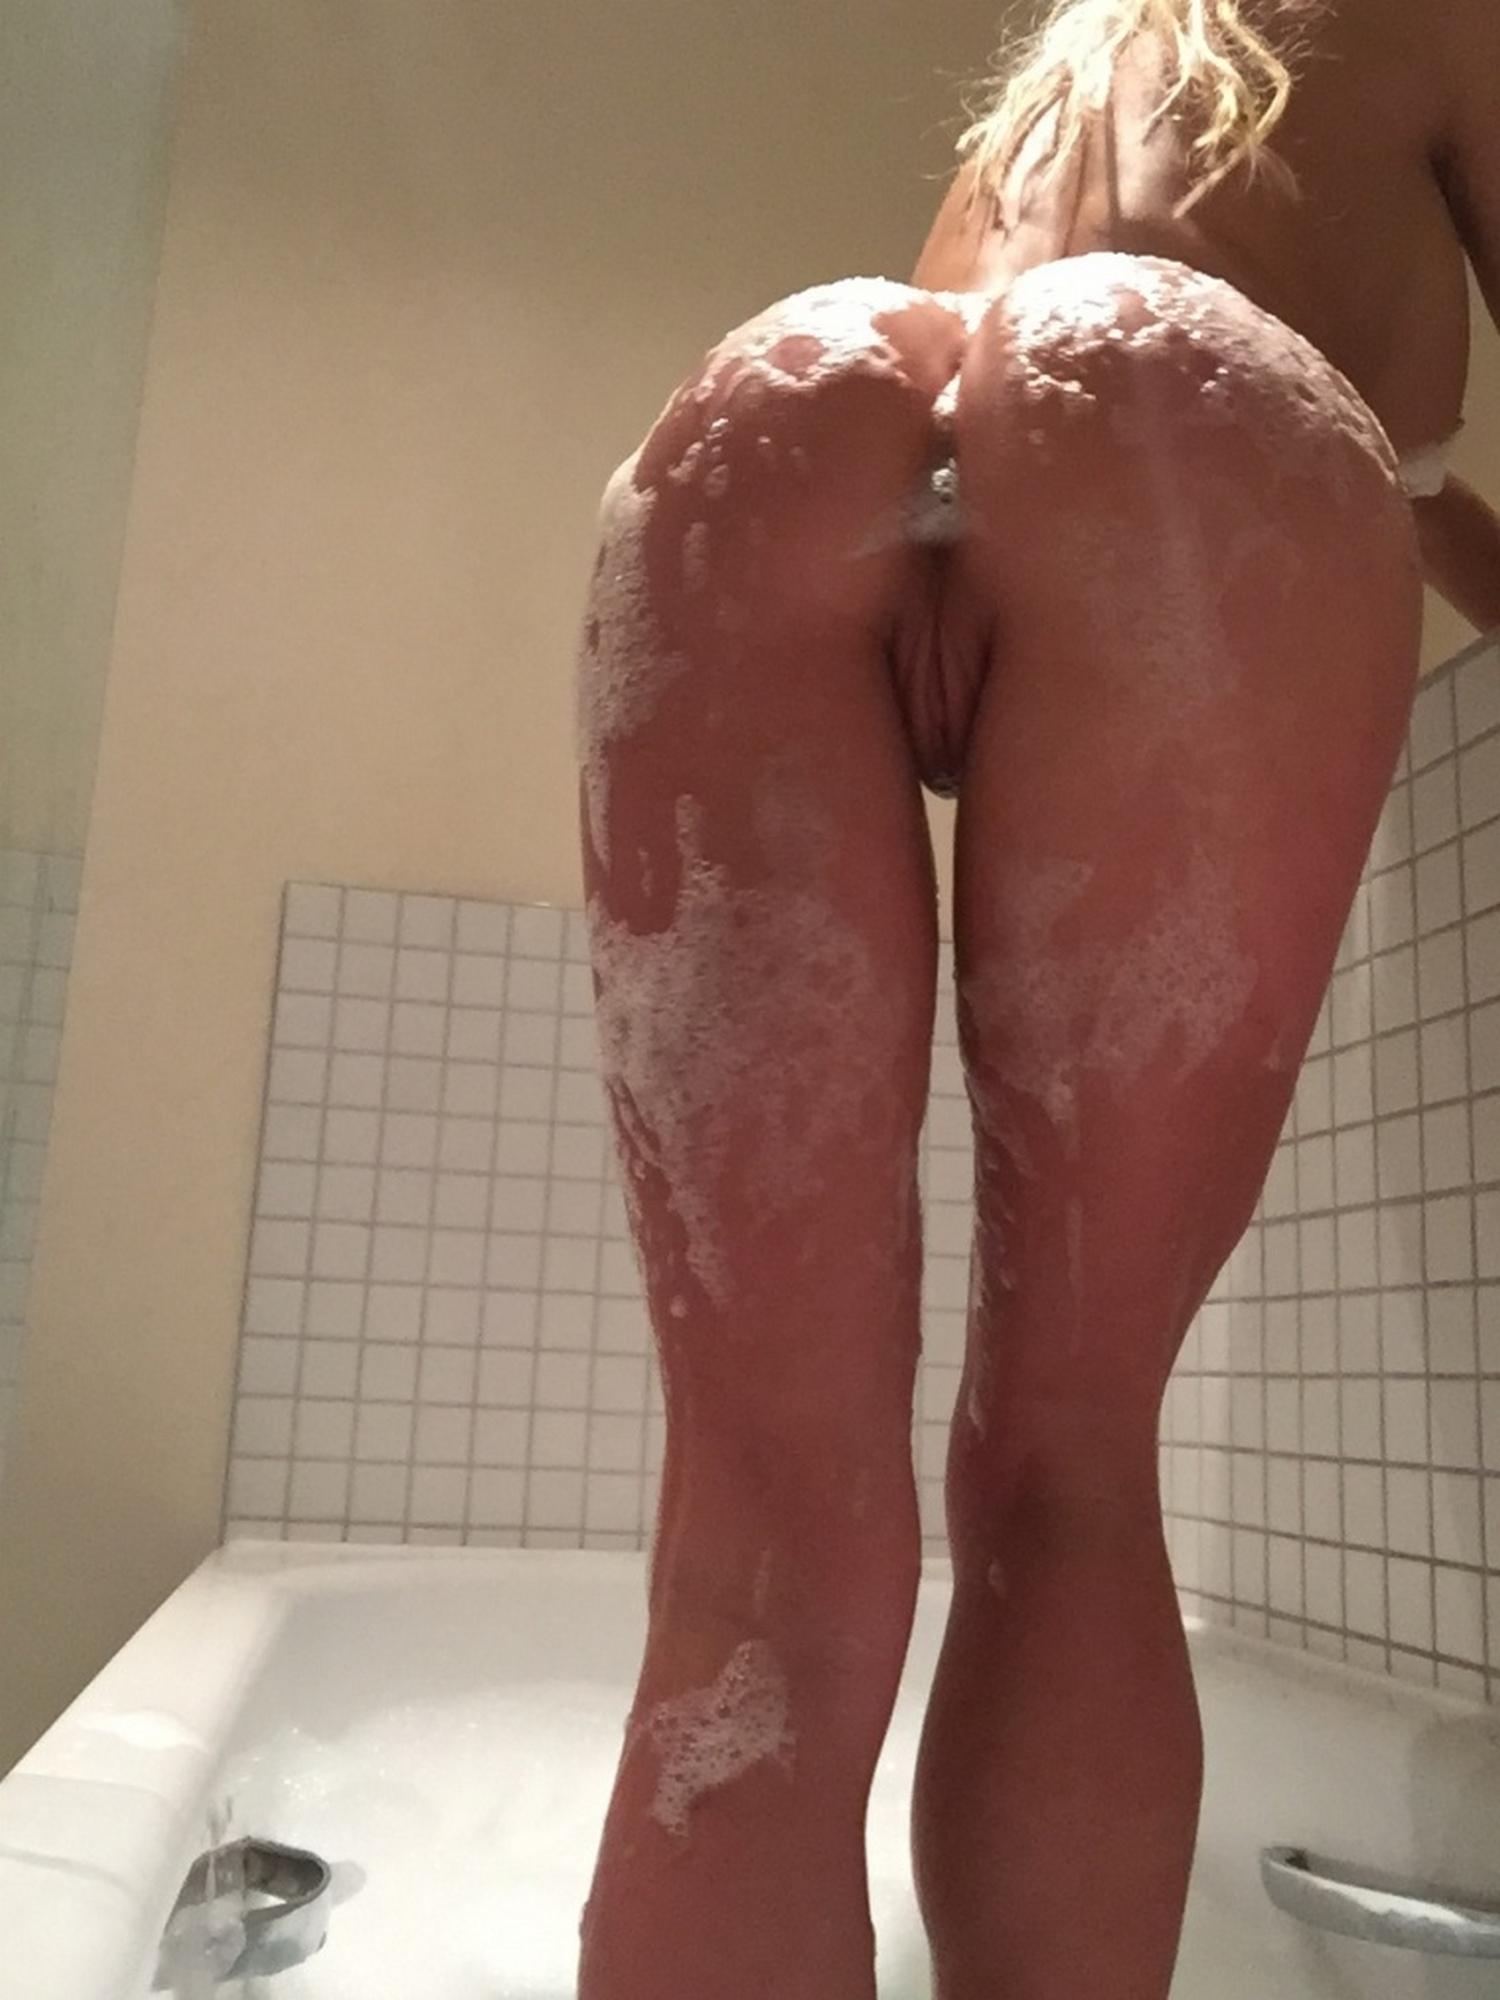 На кухне светлая порноактриса снимает на телефон силиконовые буфера и киску секс фото